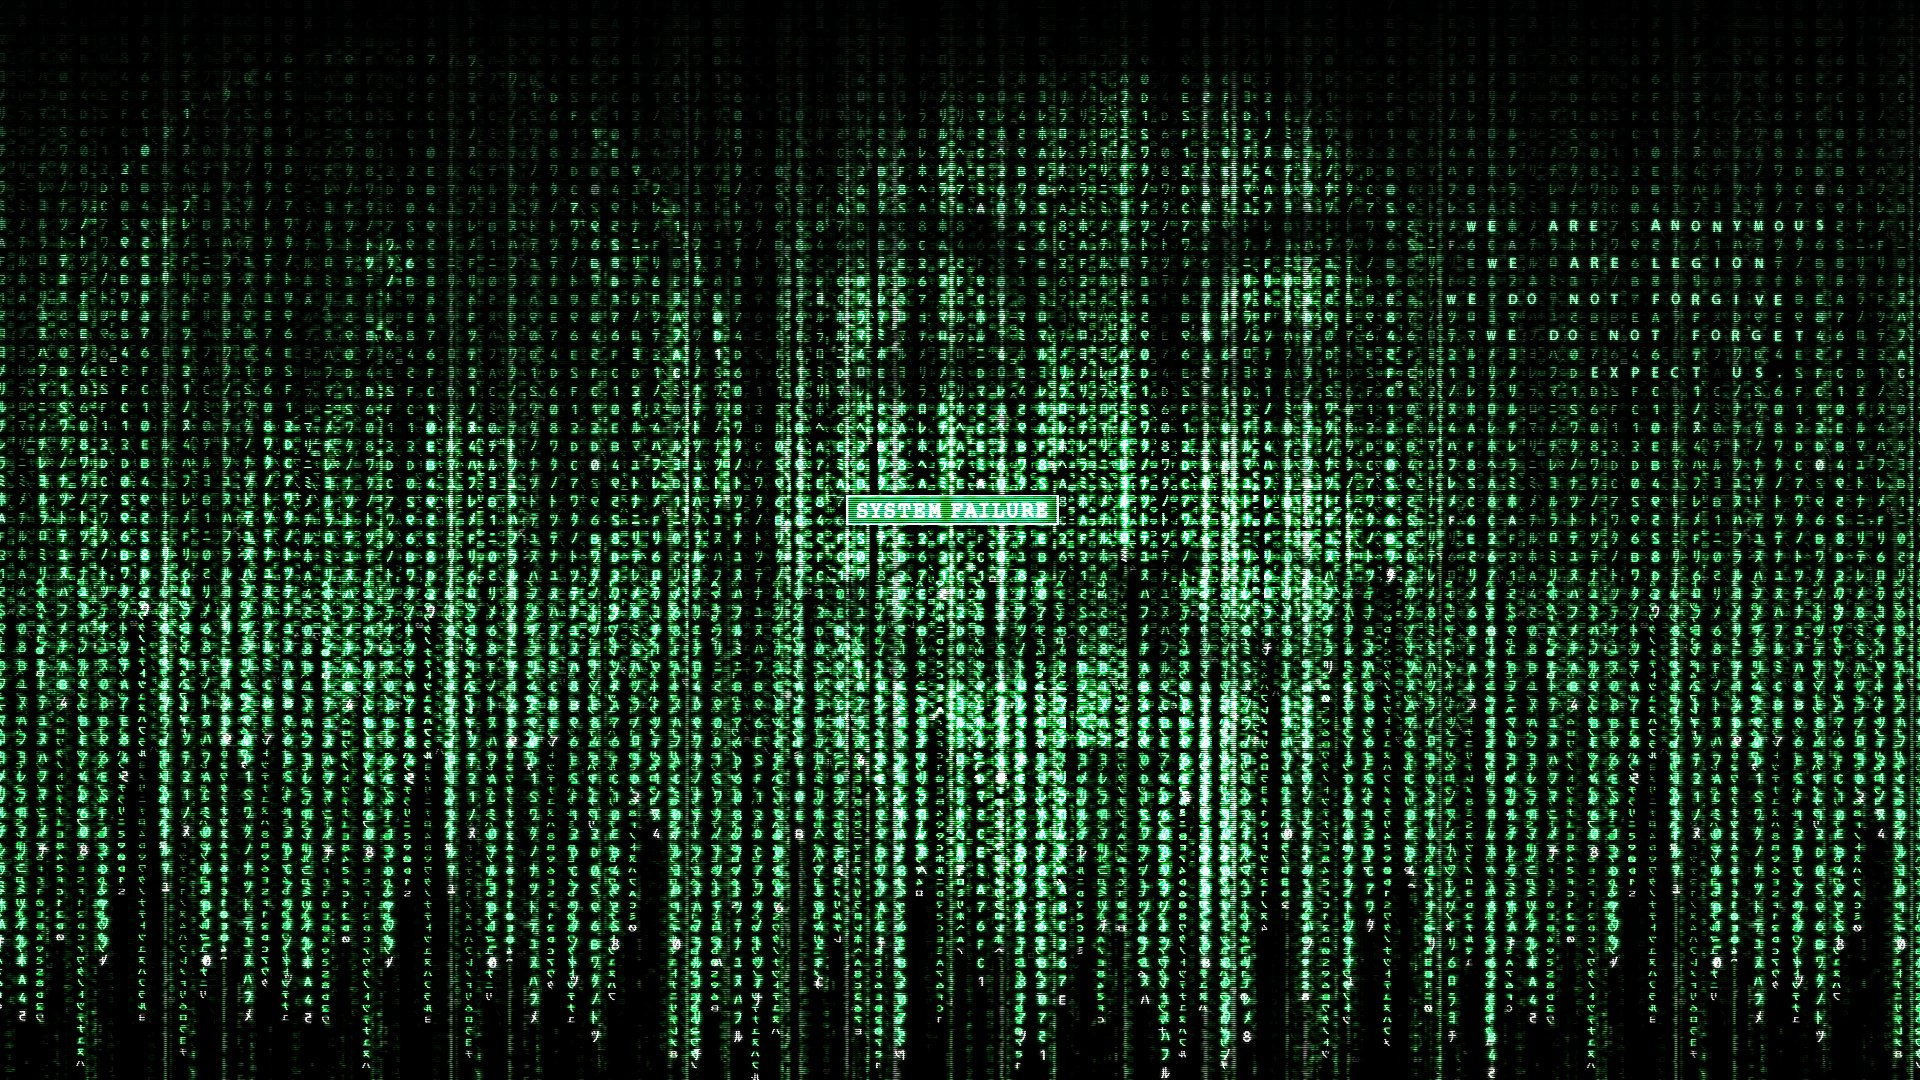 hacker tous les desktop wallpaper download fonds cran hacker tous les 1920x1080